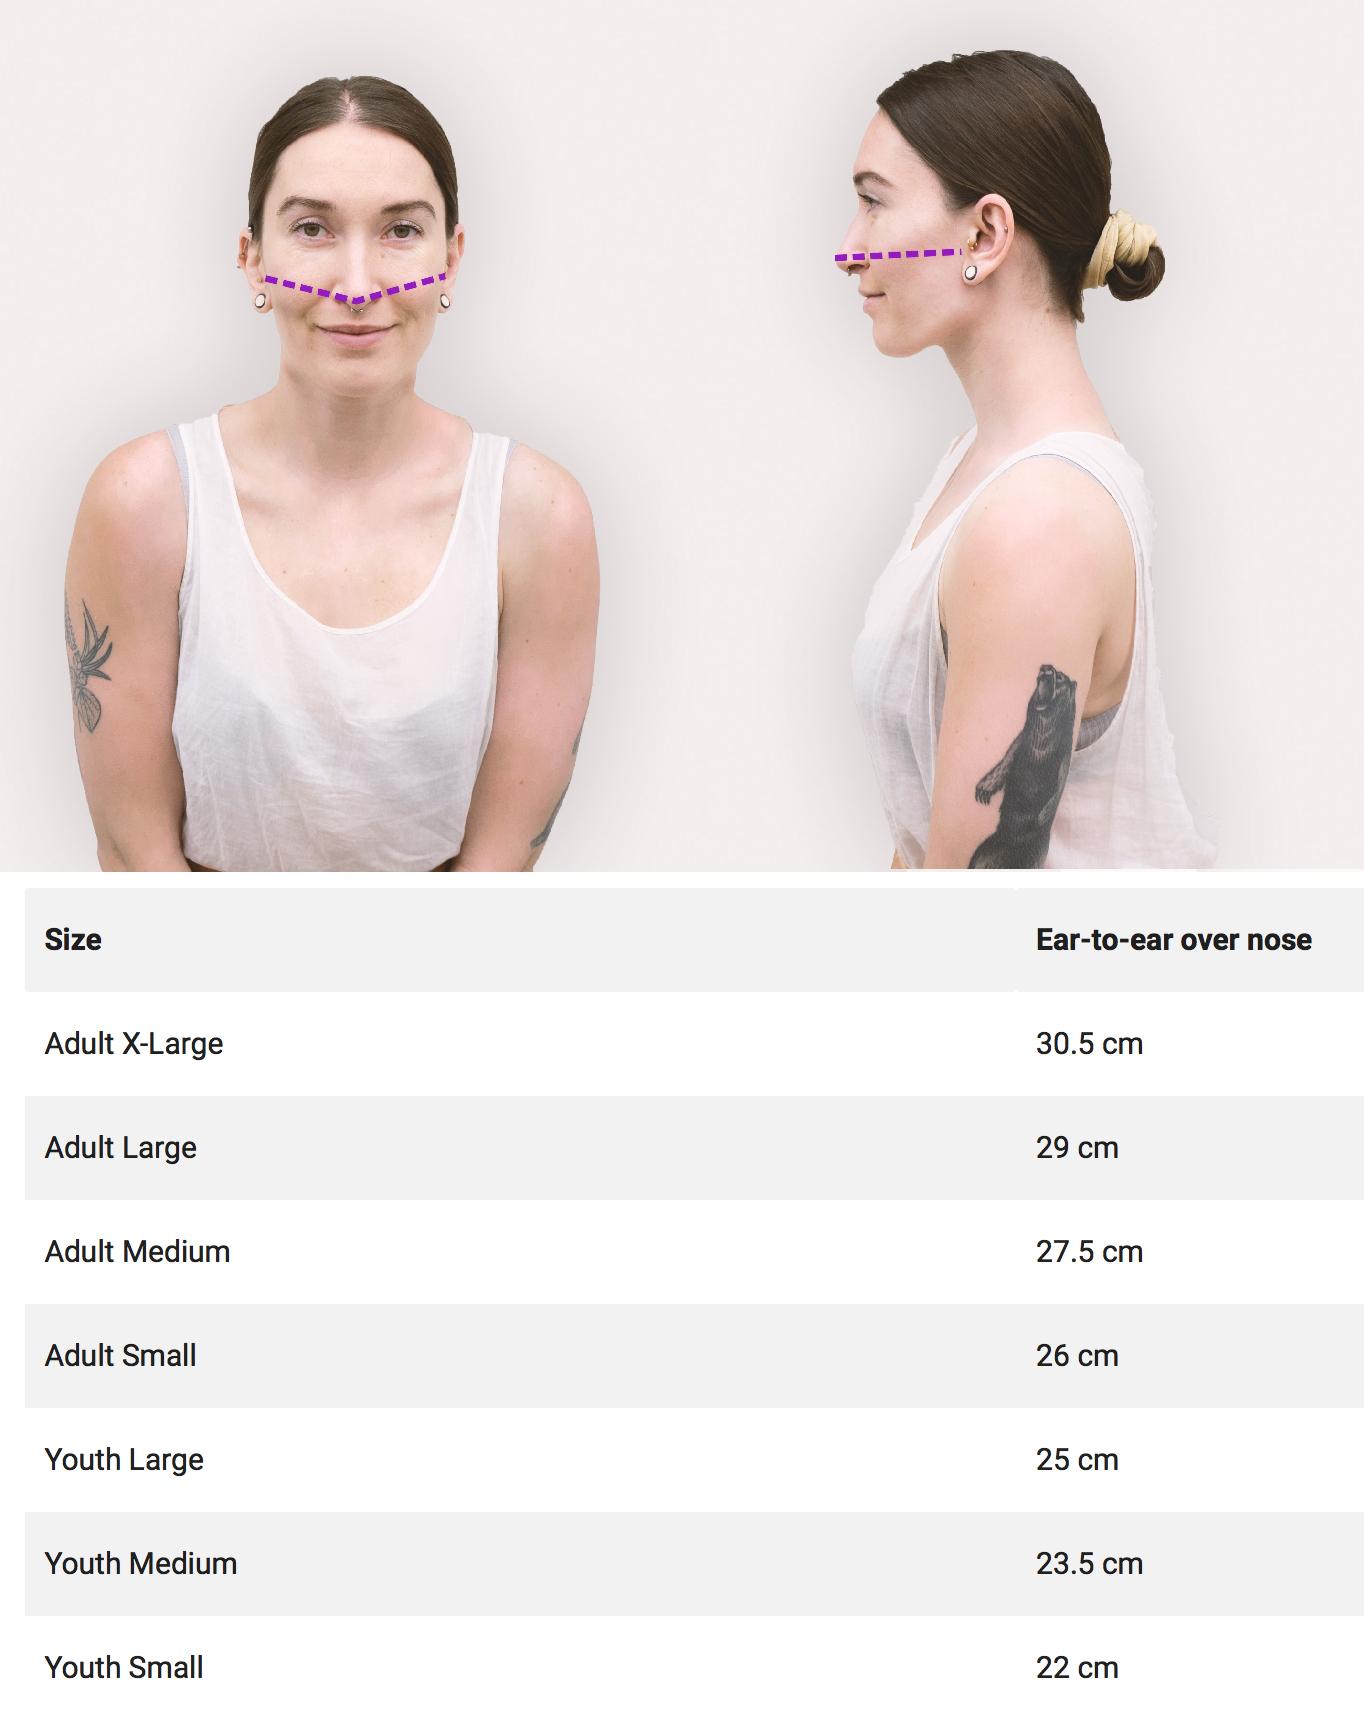 Violin Face Mask Measurement